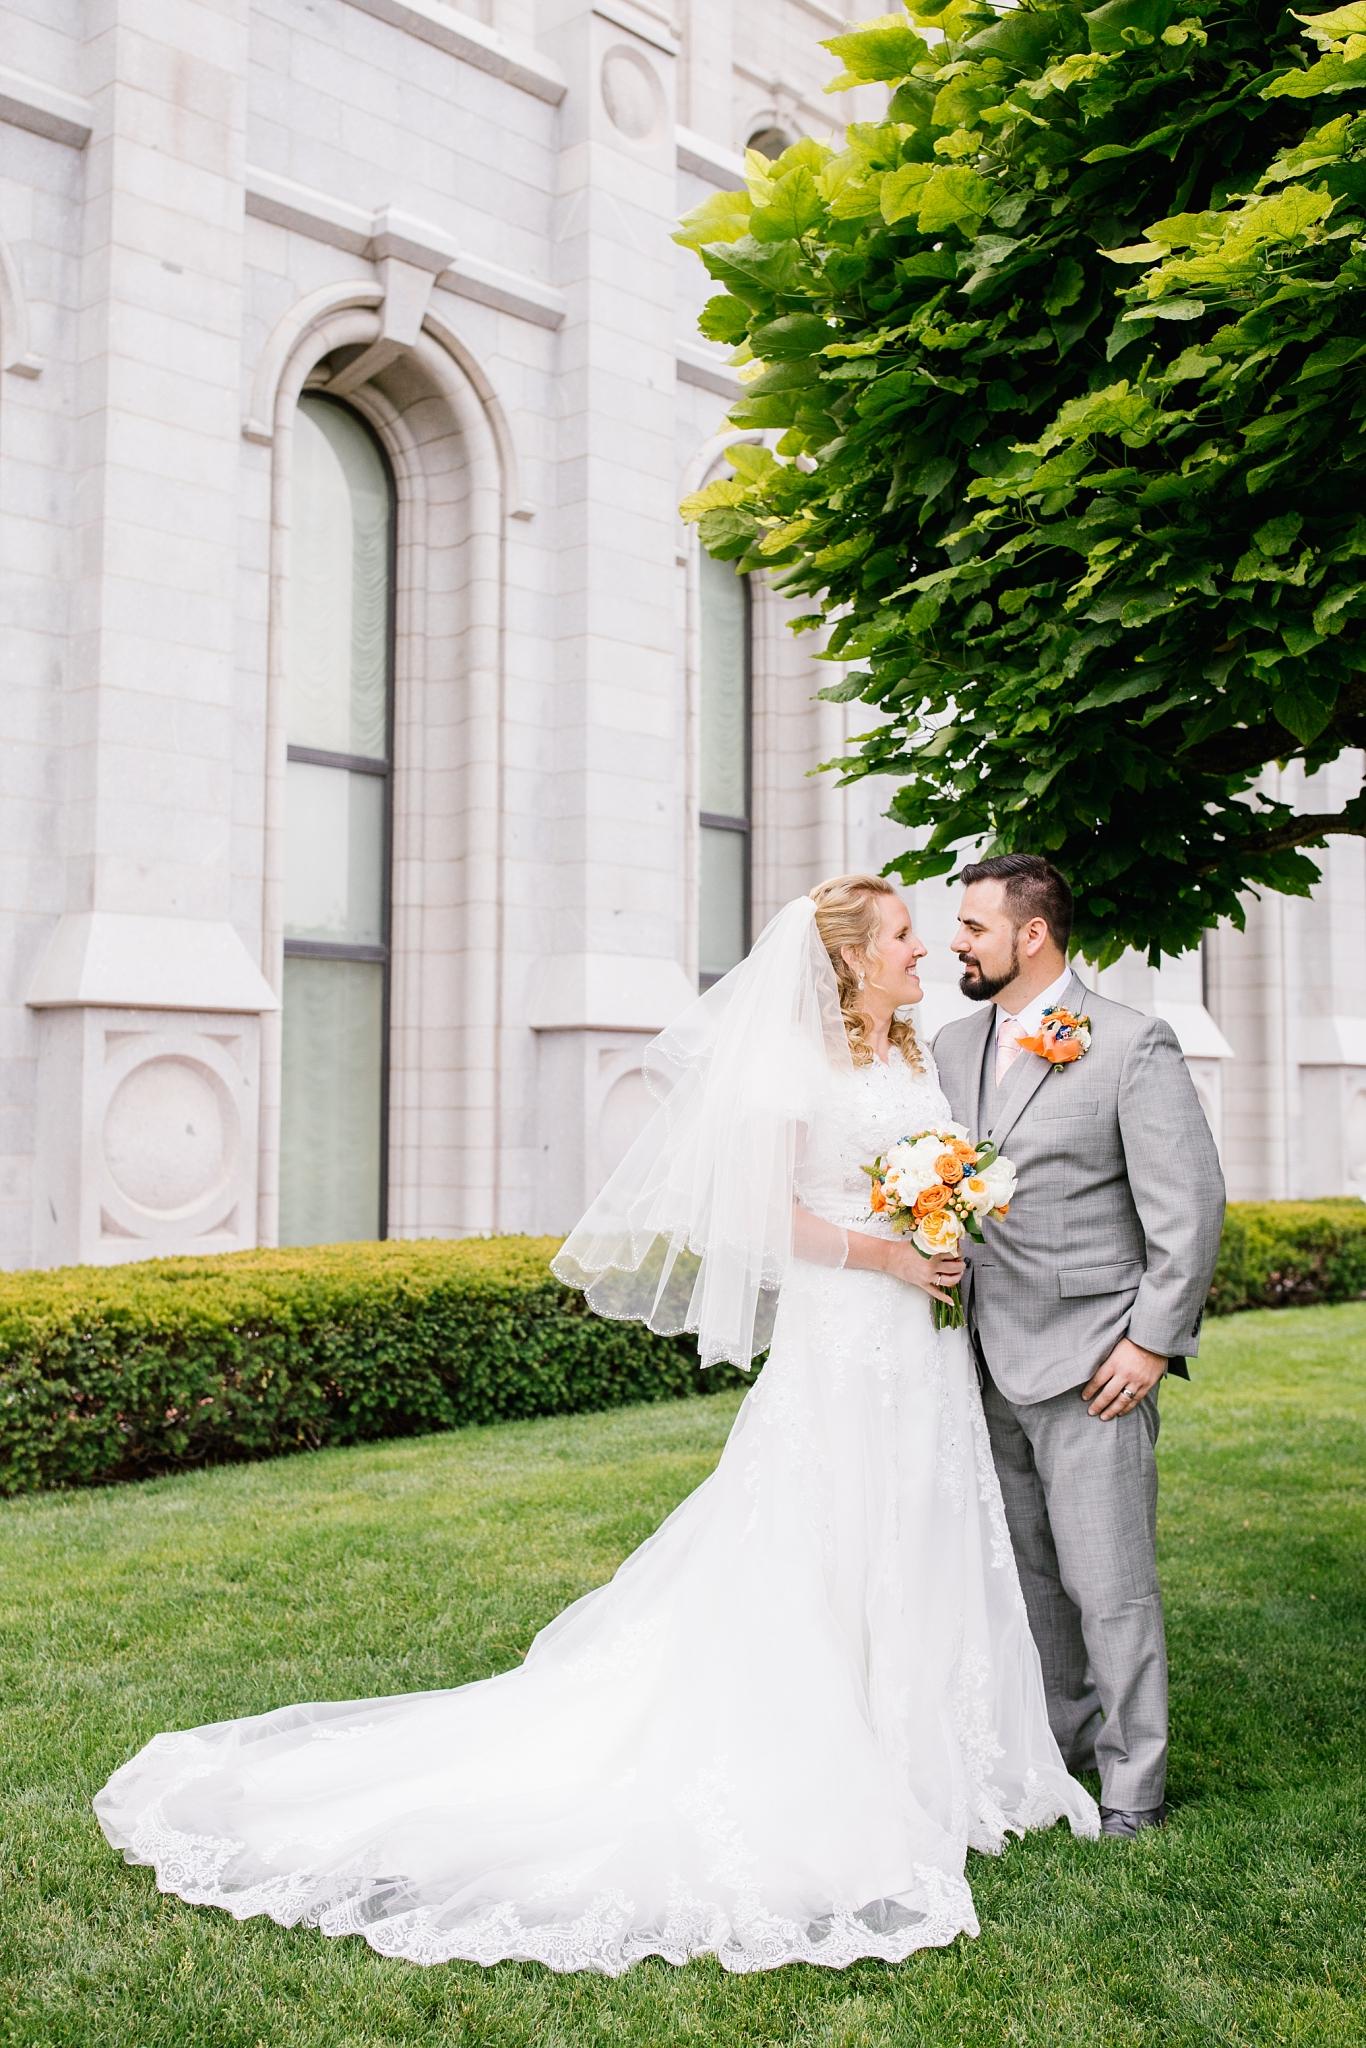 Justin and Melissa-174_Lizzie-B-Imagery-Utah-Wedding-Photographer-Salt-Lake-City-Temple-Photographer-Lion-House-Luncheon-The-Grand-Ballroom-Bountiful.jpg